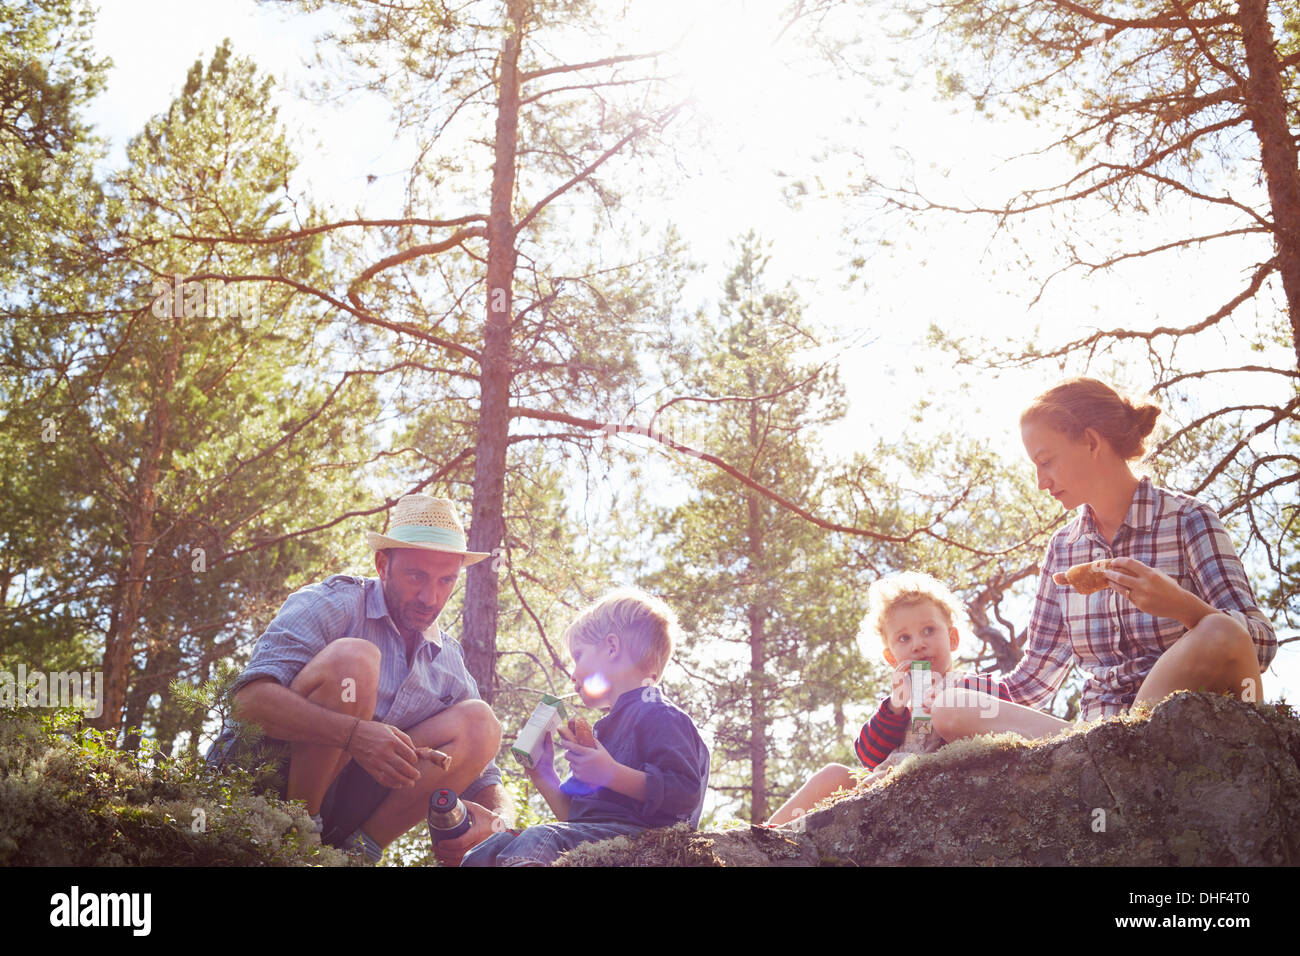 Familia sentada sobre las rocas de picnic Imagen De Stock